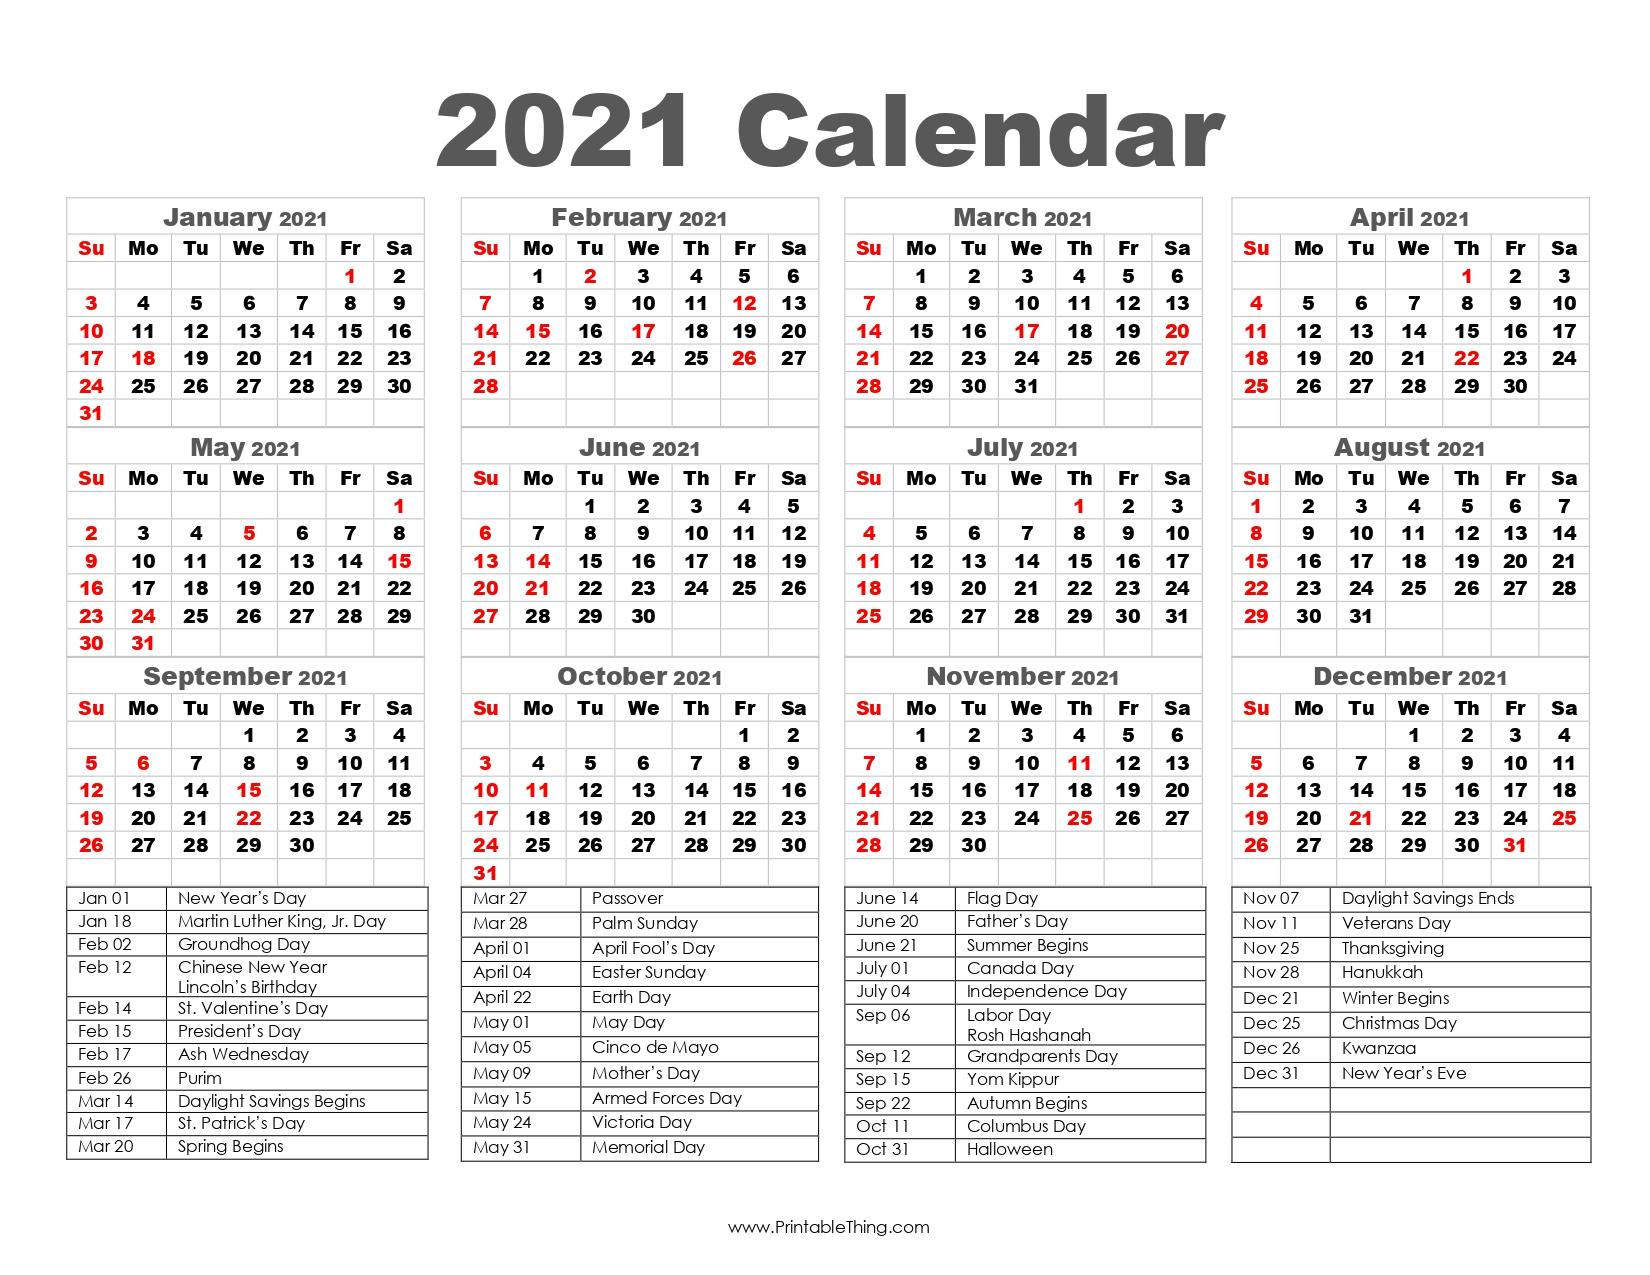 2021 Calendar Printable One Page, 2021 Calendar Printable PDF